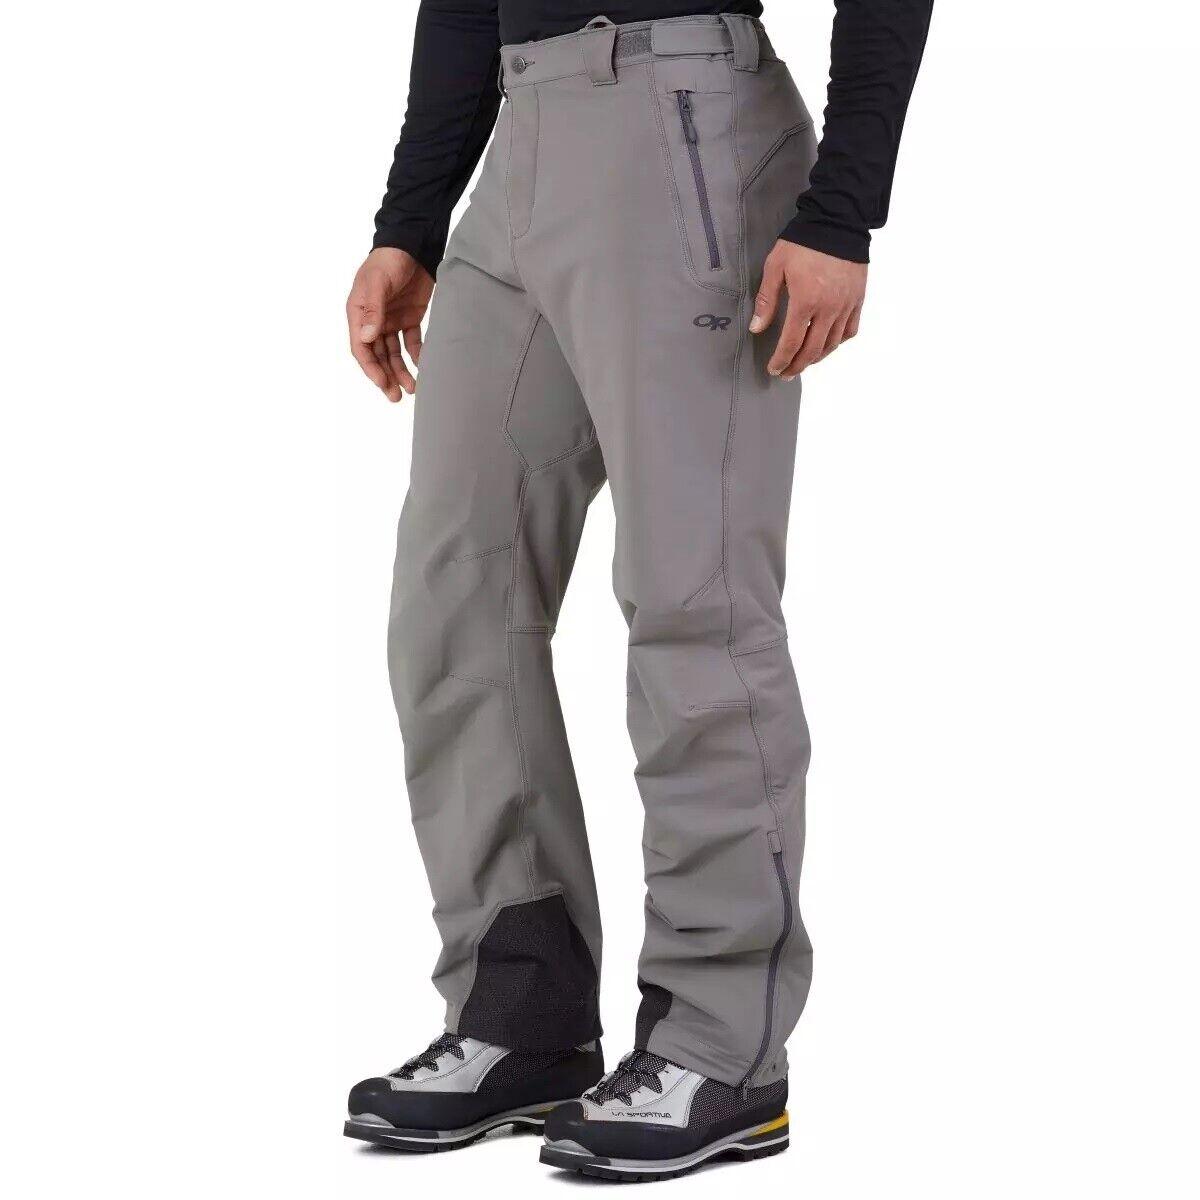 Outdoor Outdoor Outdoor Research Uomo Cirque II Pantaloni Peltro 00b